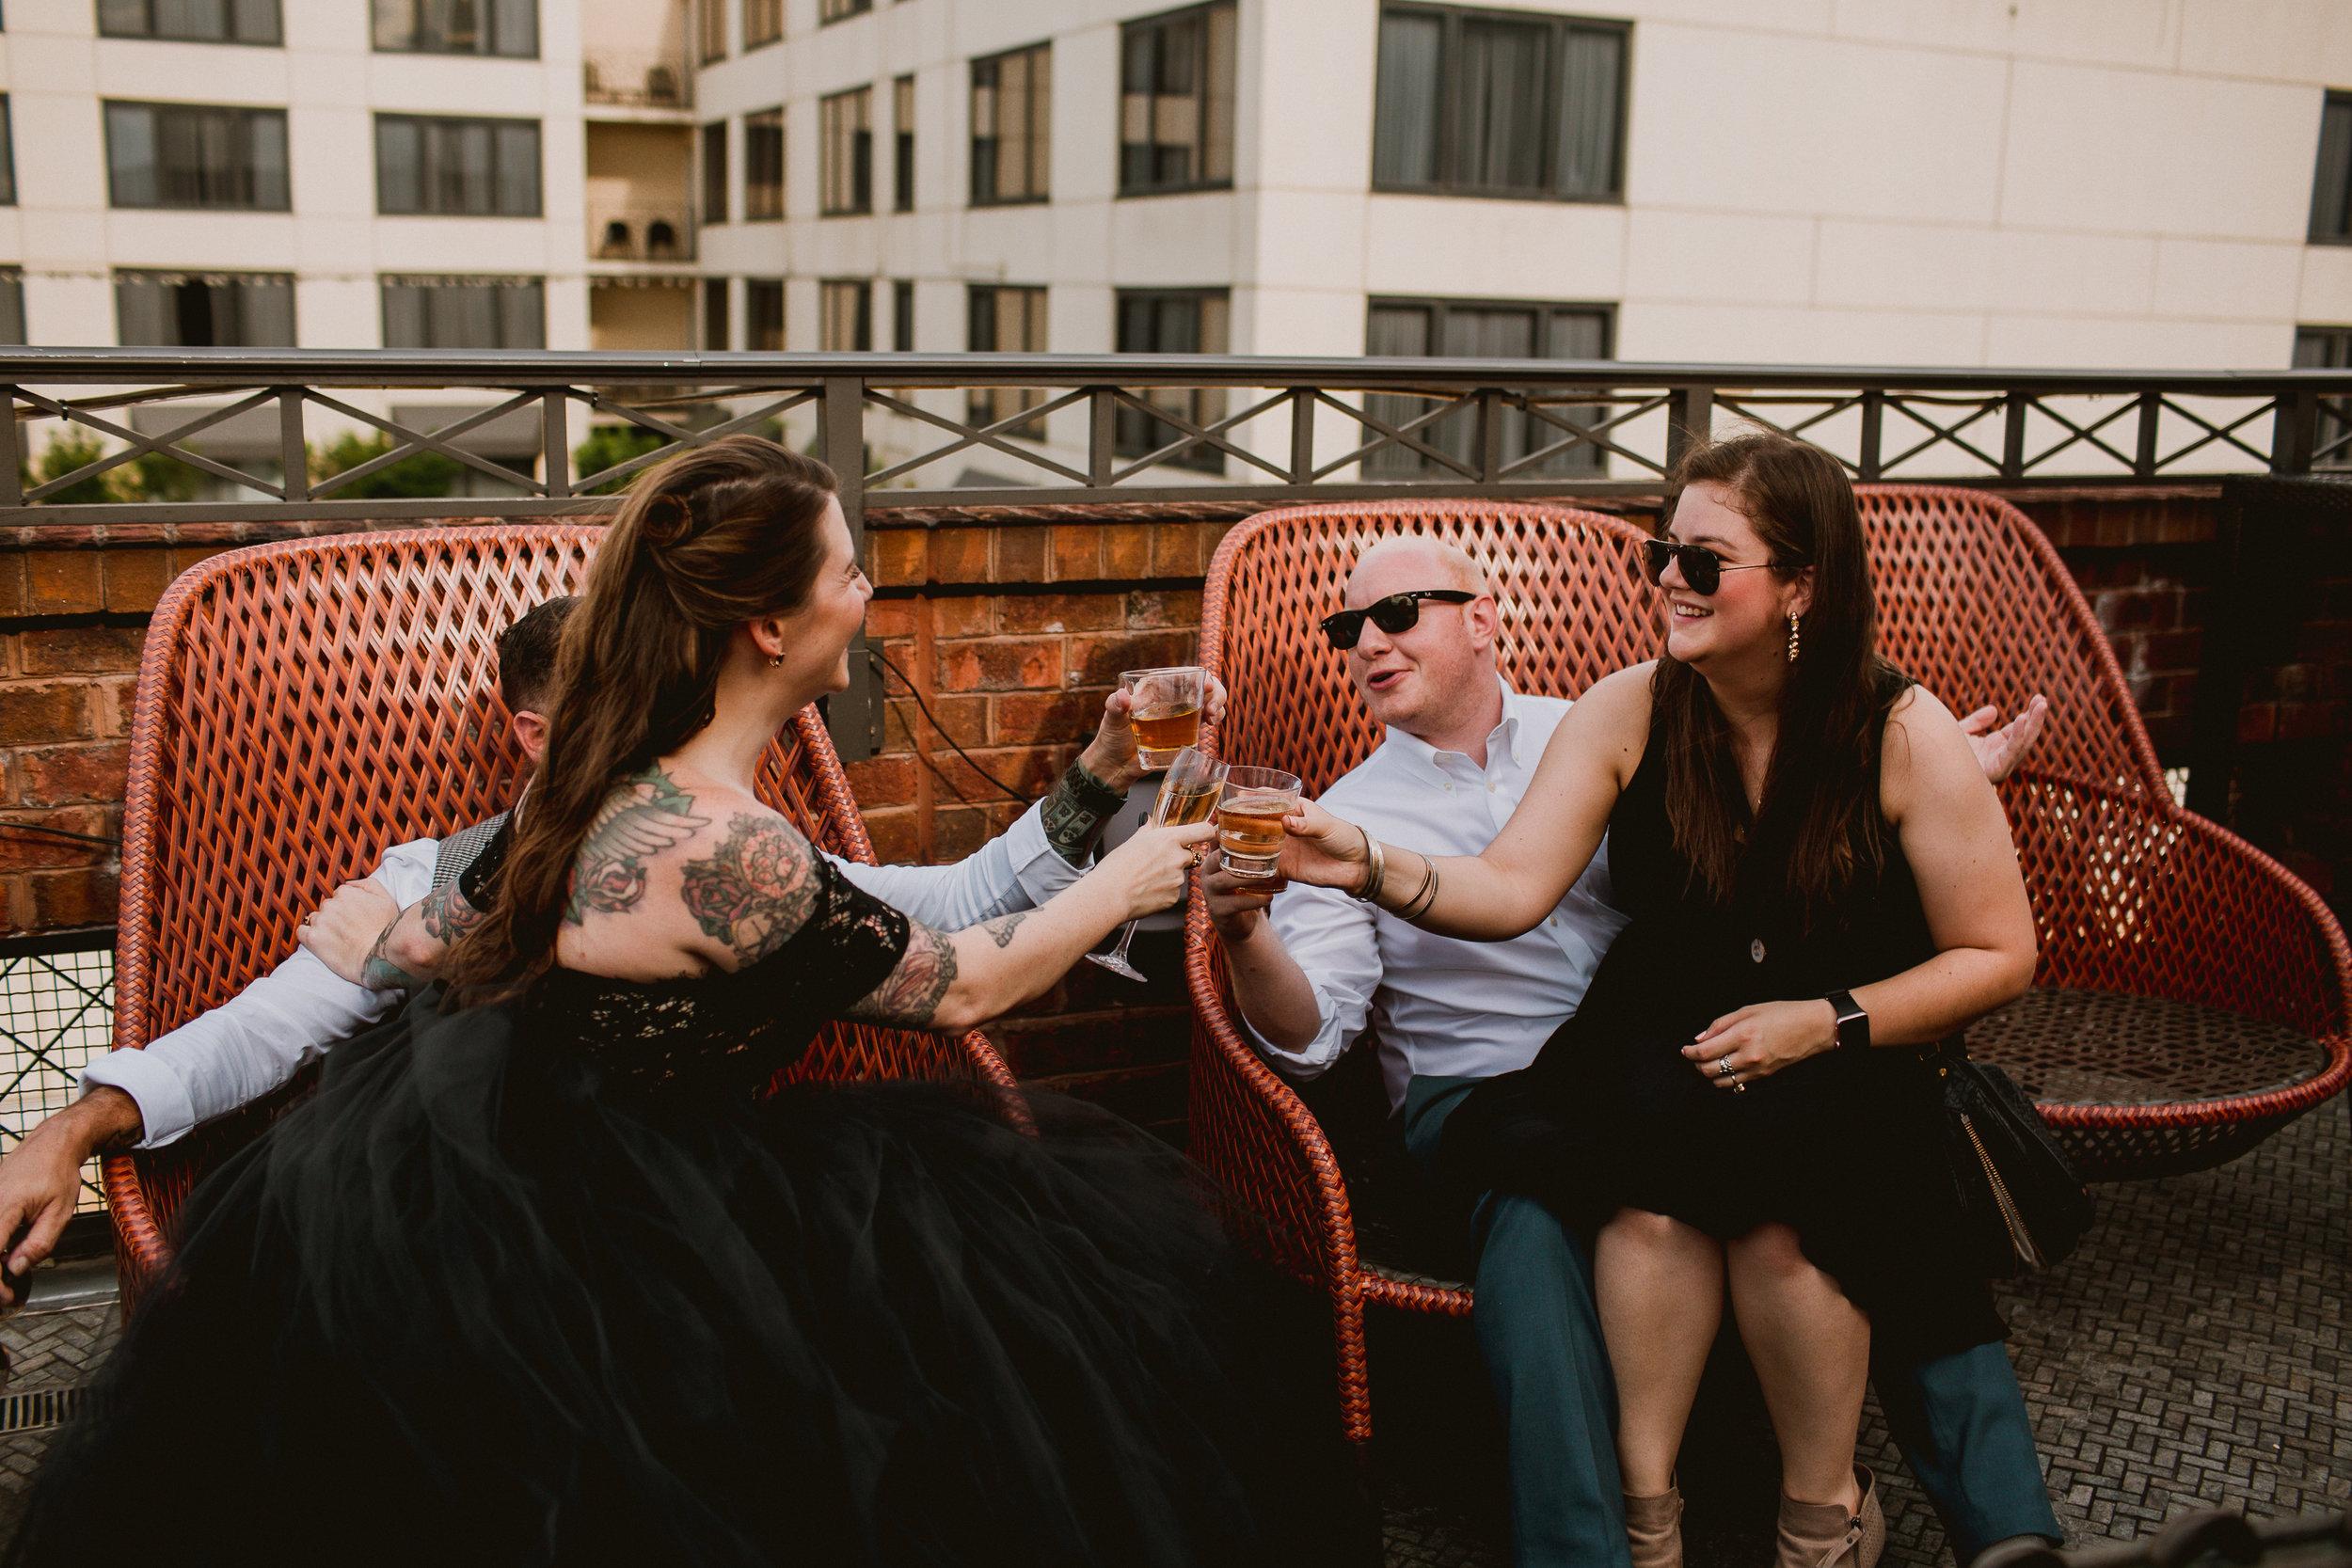 bohemian-hotel-savannah-elopement-kelley-raye-atlanta-wedding-photographer-52.jpg